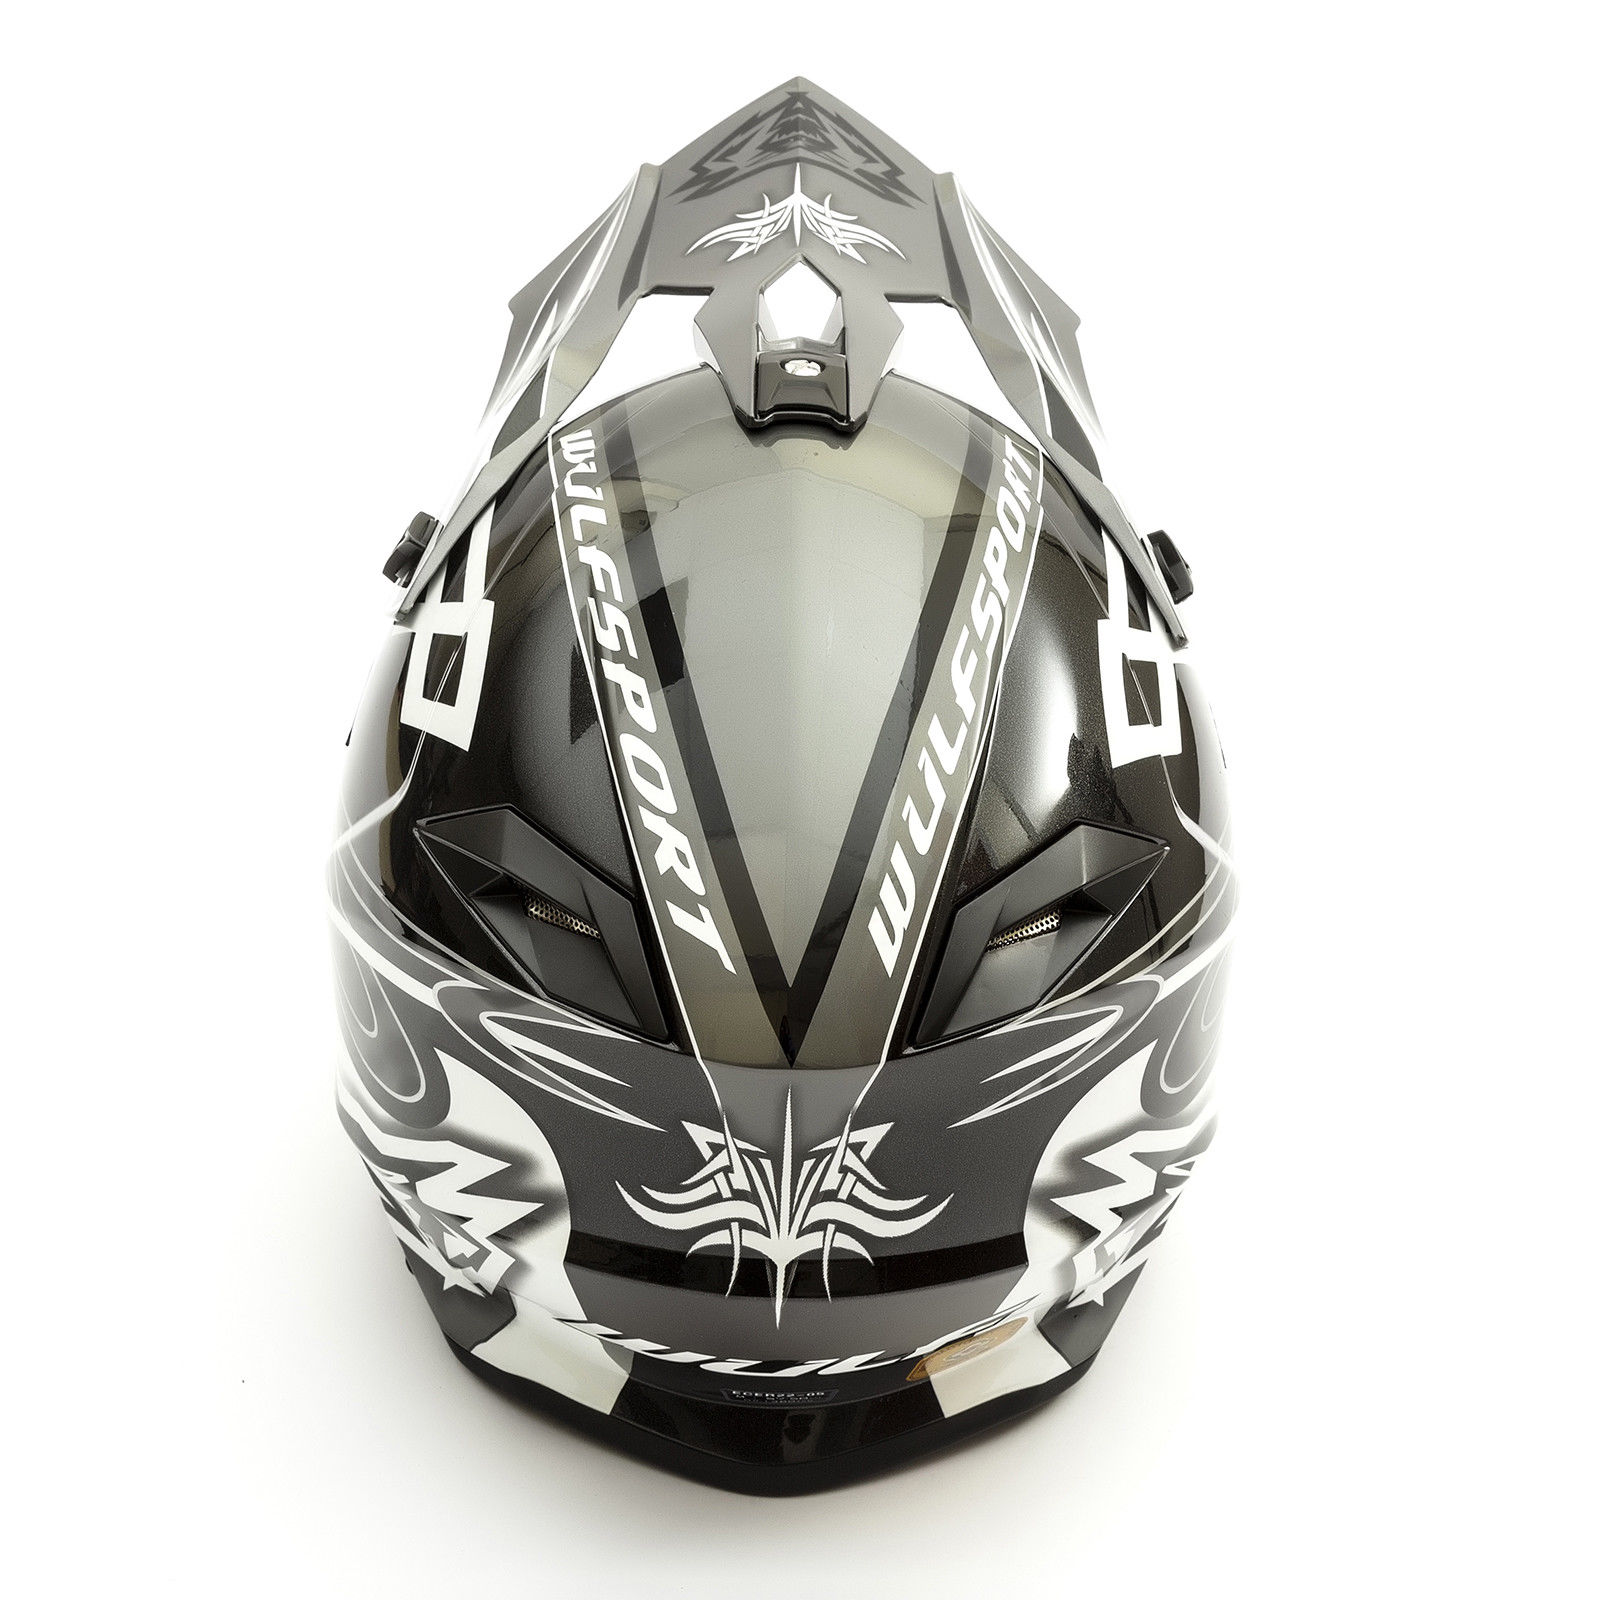 Wulfsport-Adult-Sceptre-Helmets-Motocross-Pitbike-Motorbike-Off-Road-Racing-ATV thumbnail 6